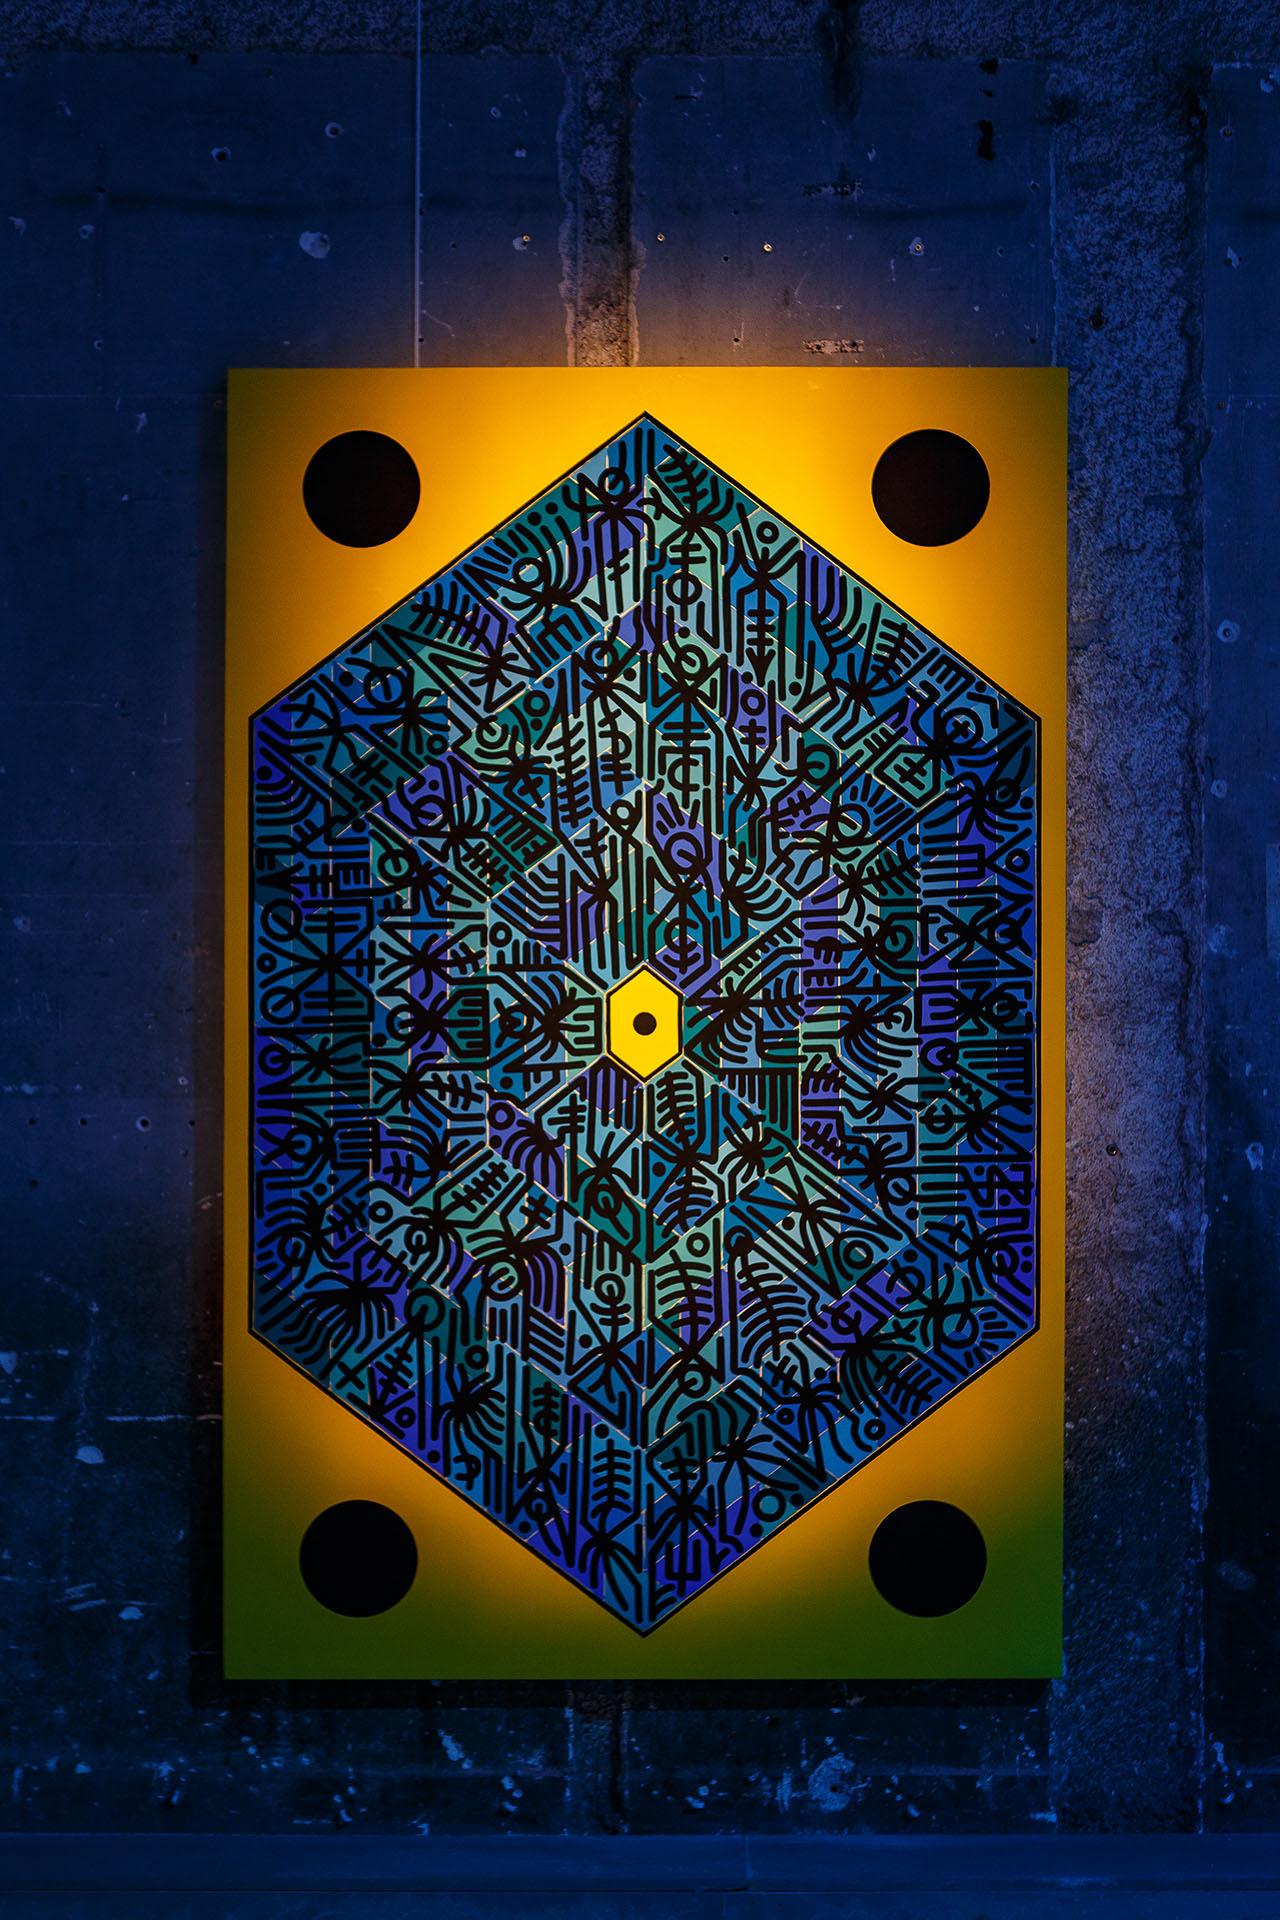 Artwork by Dimitris Dokos, inspired by Bombay Sapphire's CANVAS brand hexagonal pattern. Photo by Kostas Dekoumes© Yatzer 2019.